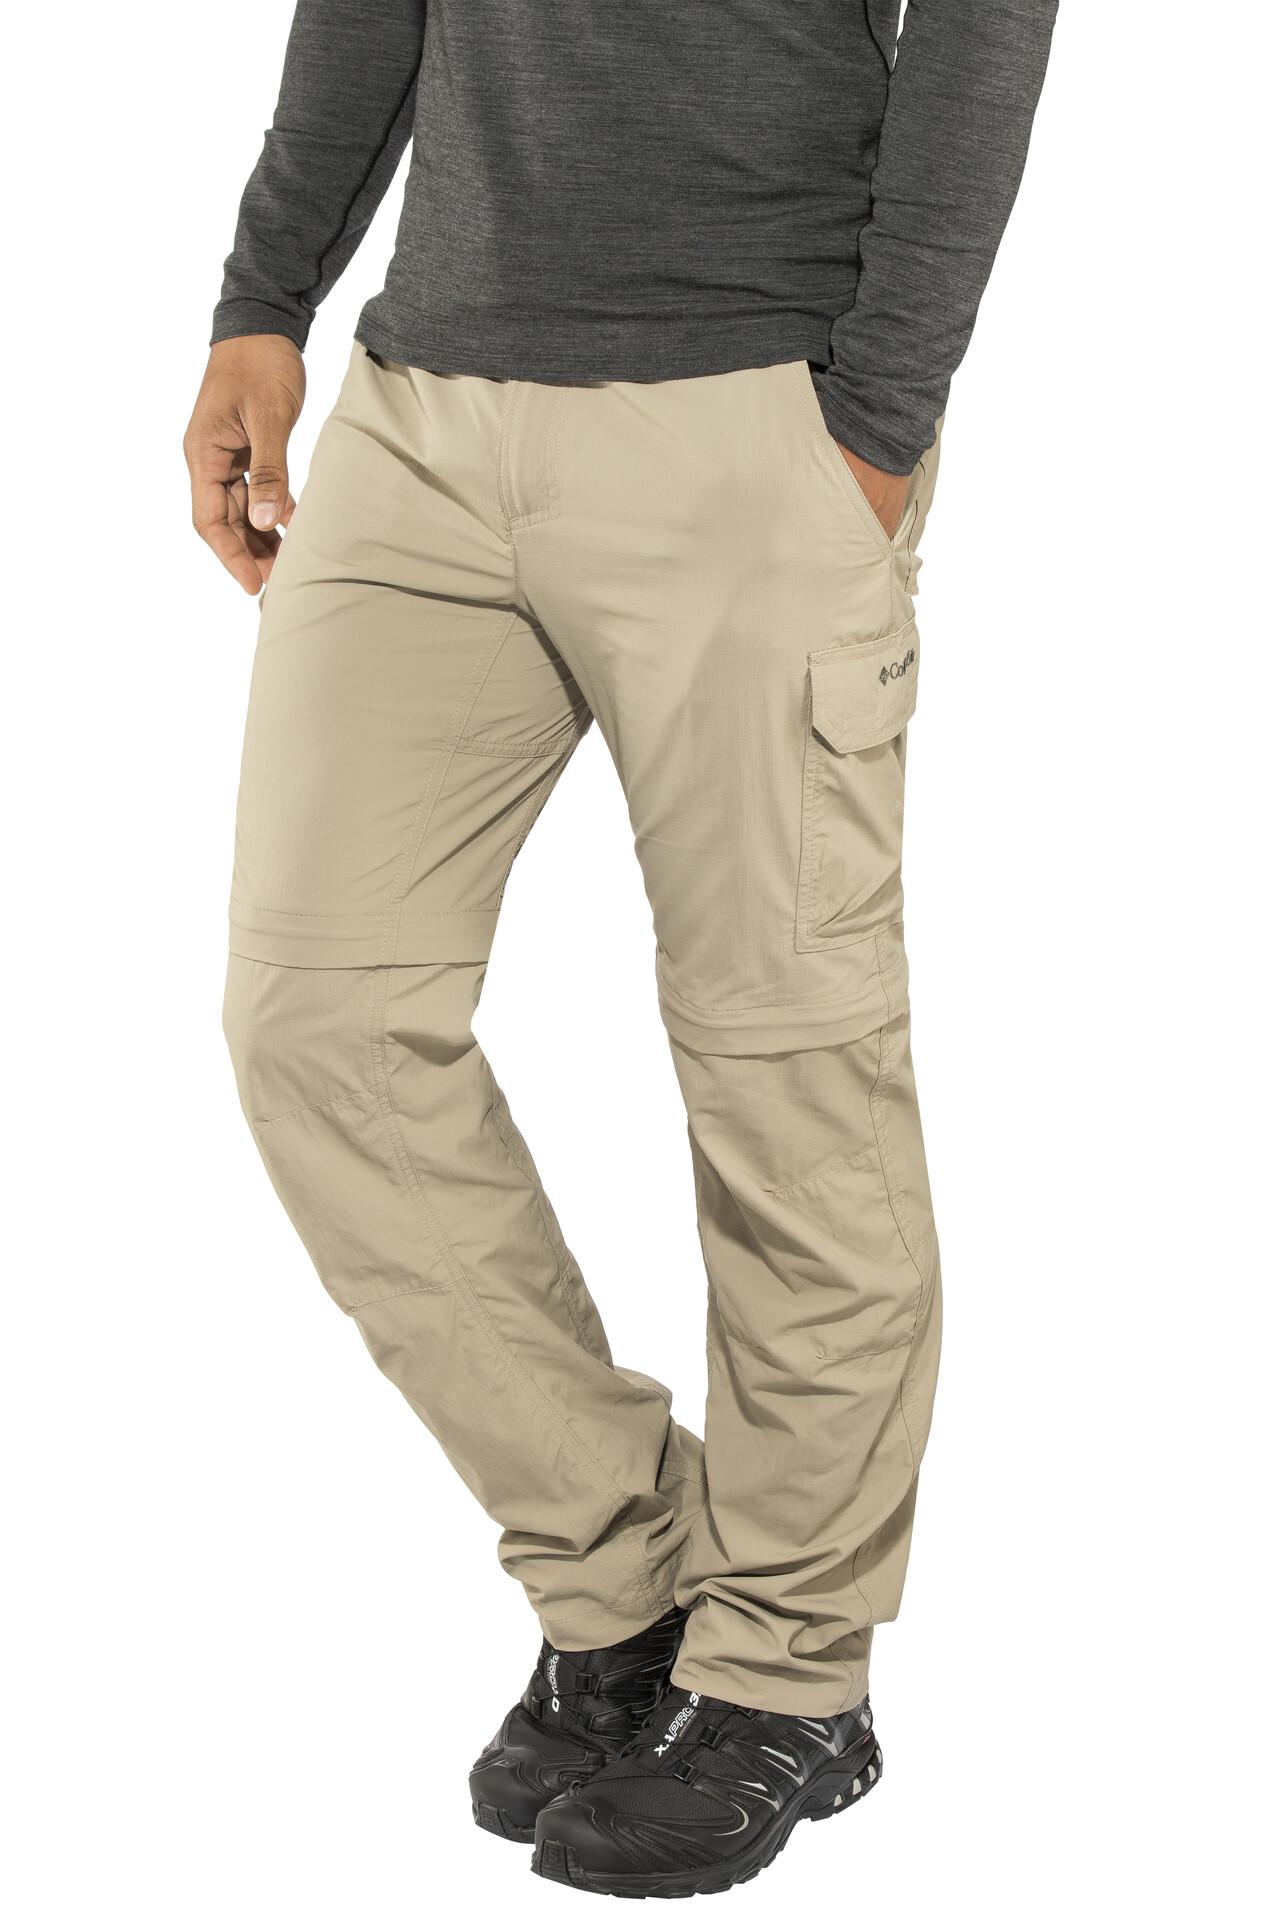 Pantalones Hombre Columbia Silver Ridge II